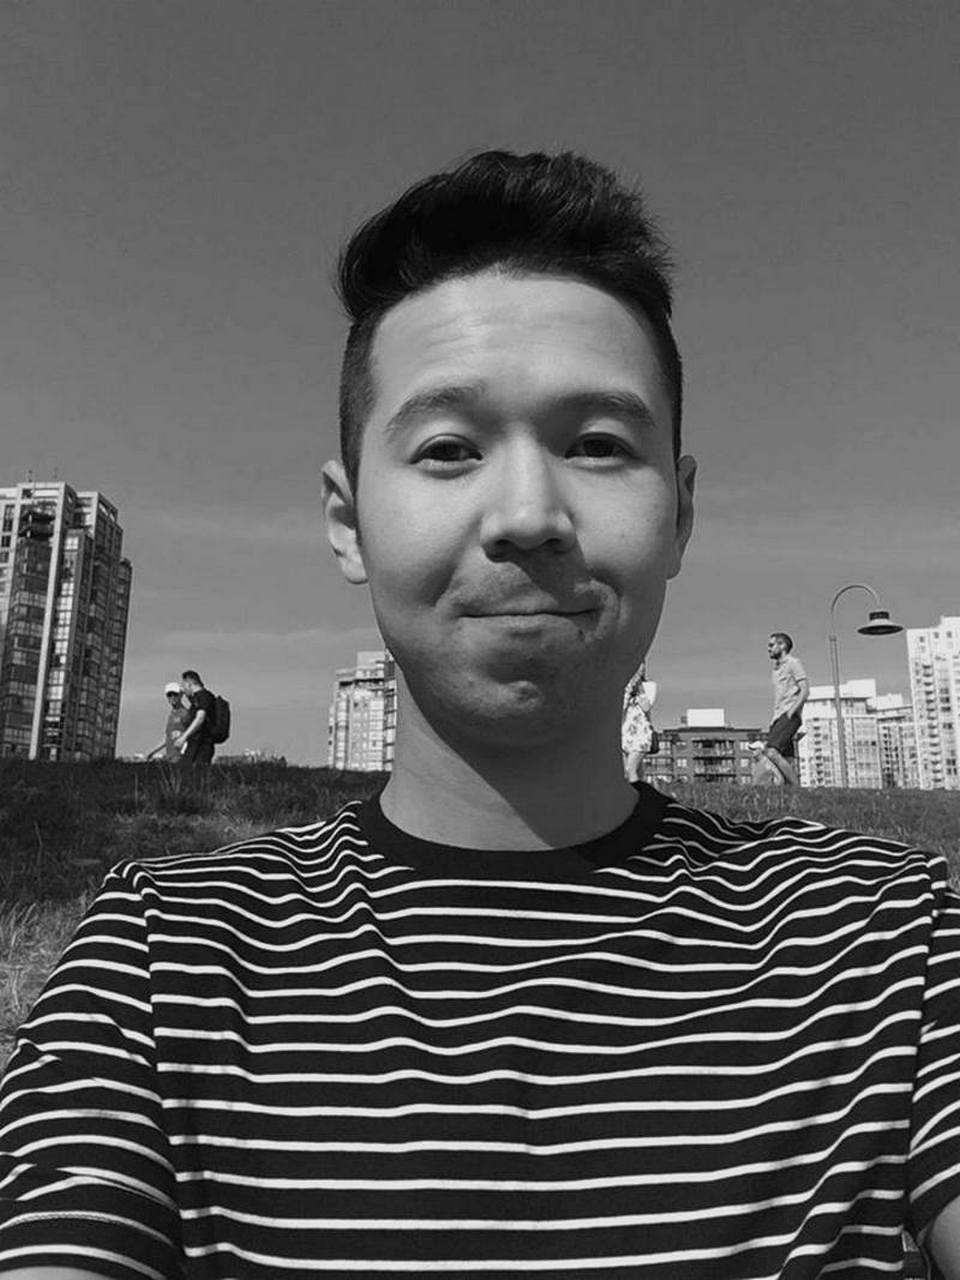 Метхат Абенов трагически погиб в горах Ванкувера